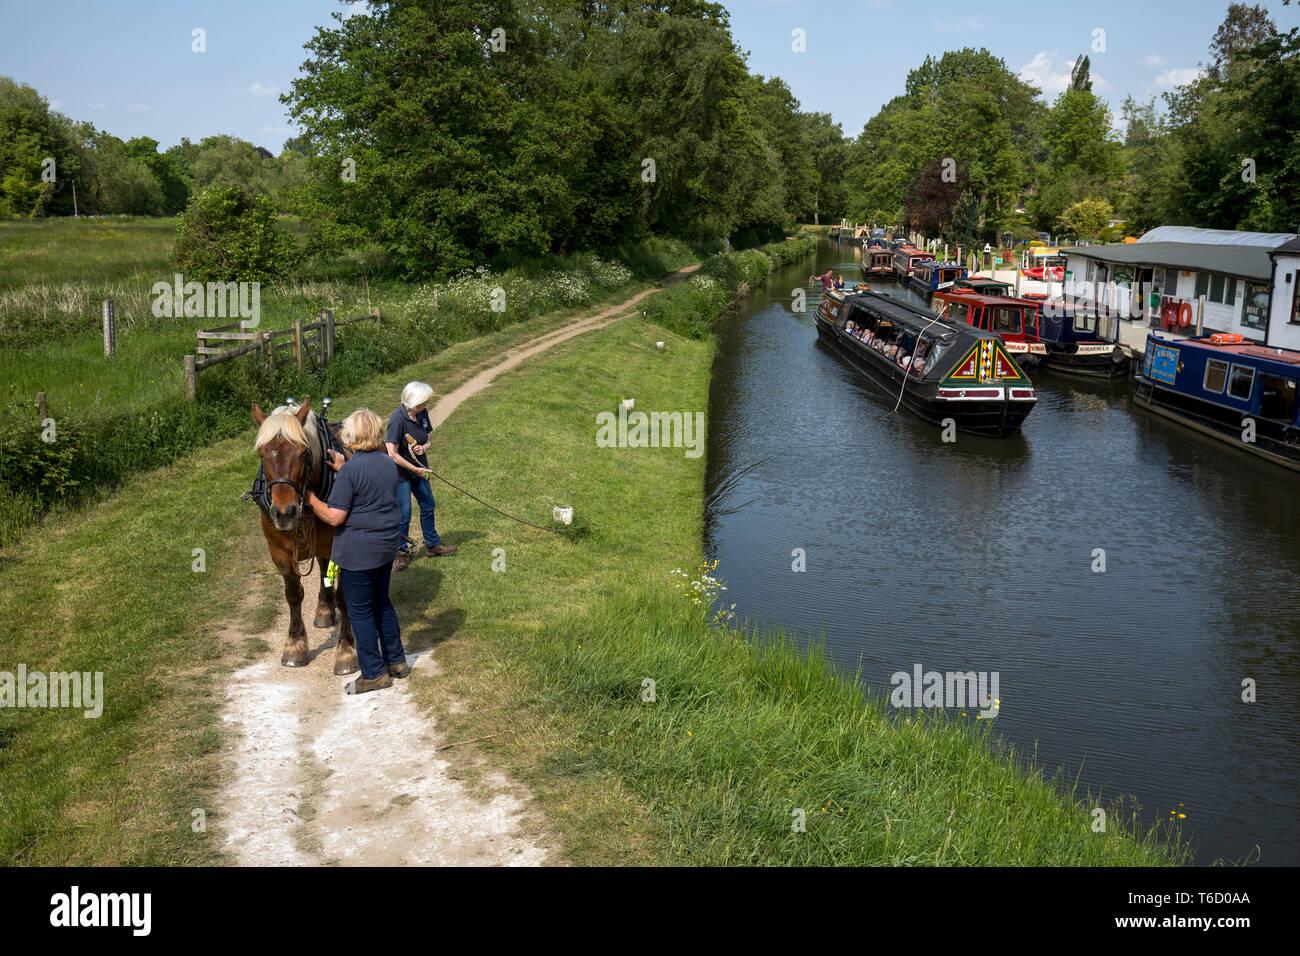 Godalming; Horse Drawn Boat; River Wey; Godalming; Surrey; UK - Stock Image